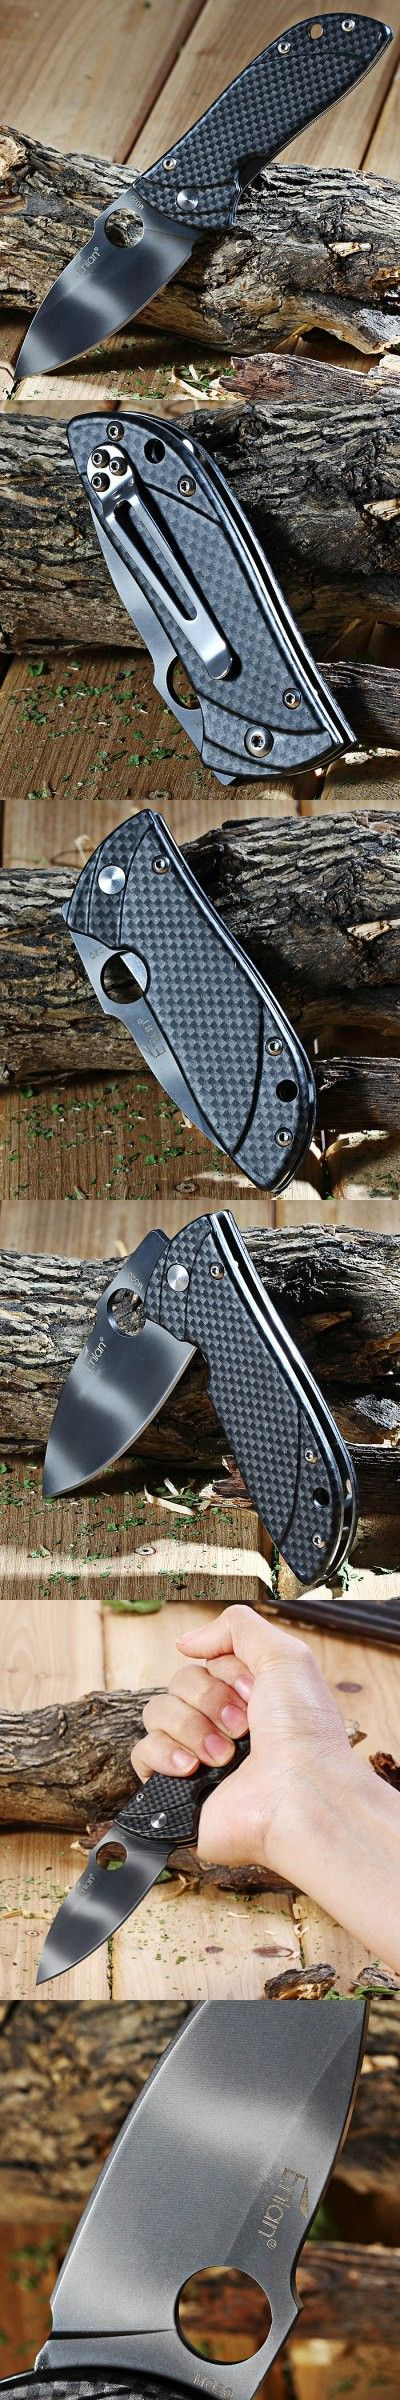 Pocket Knives and Folding Knives | Enlan M020FH Liner Lock Folding Knife